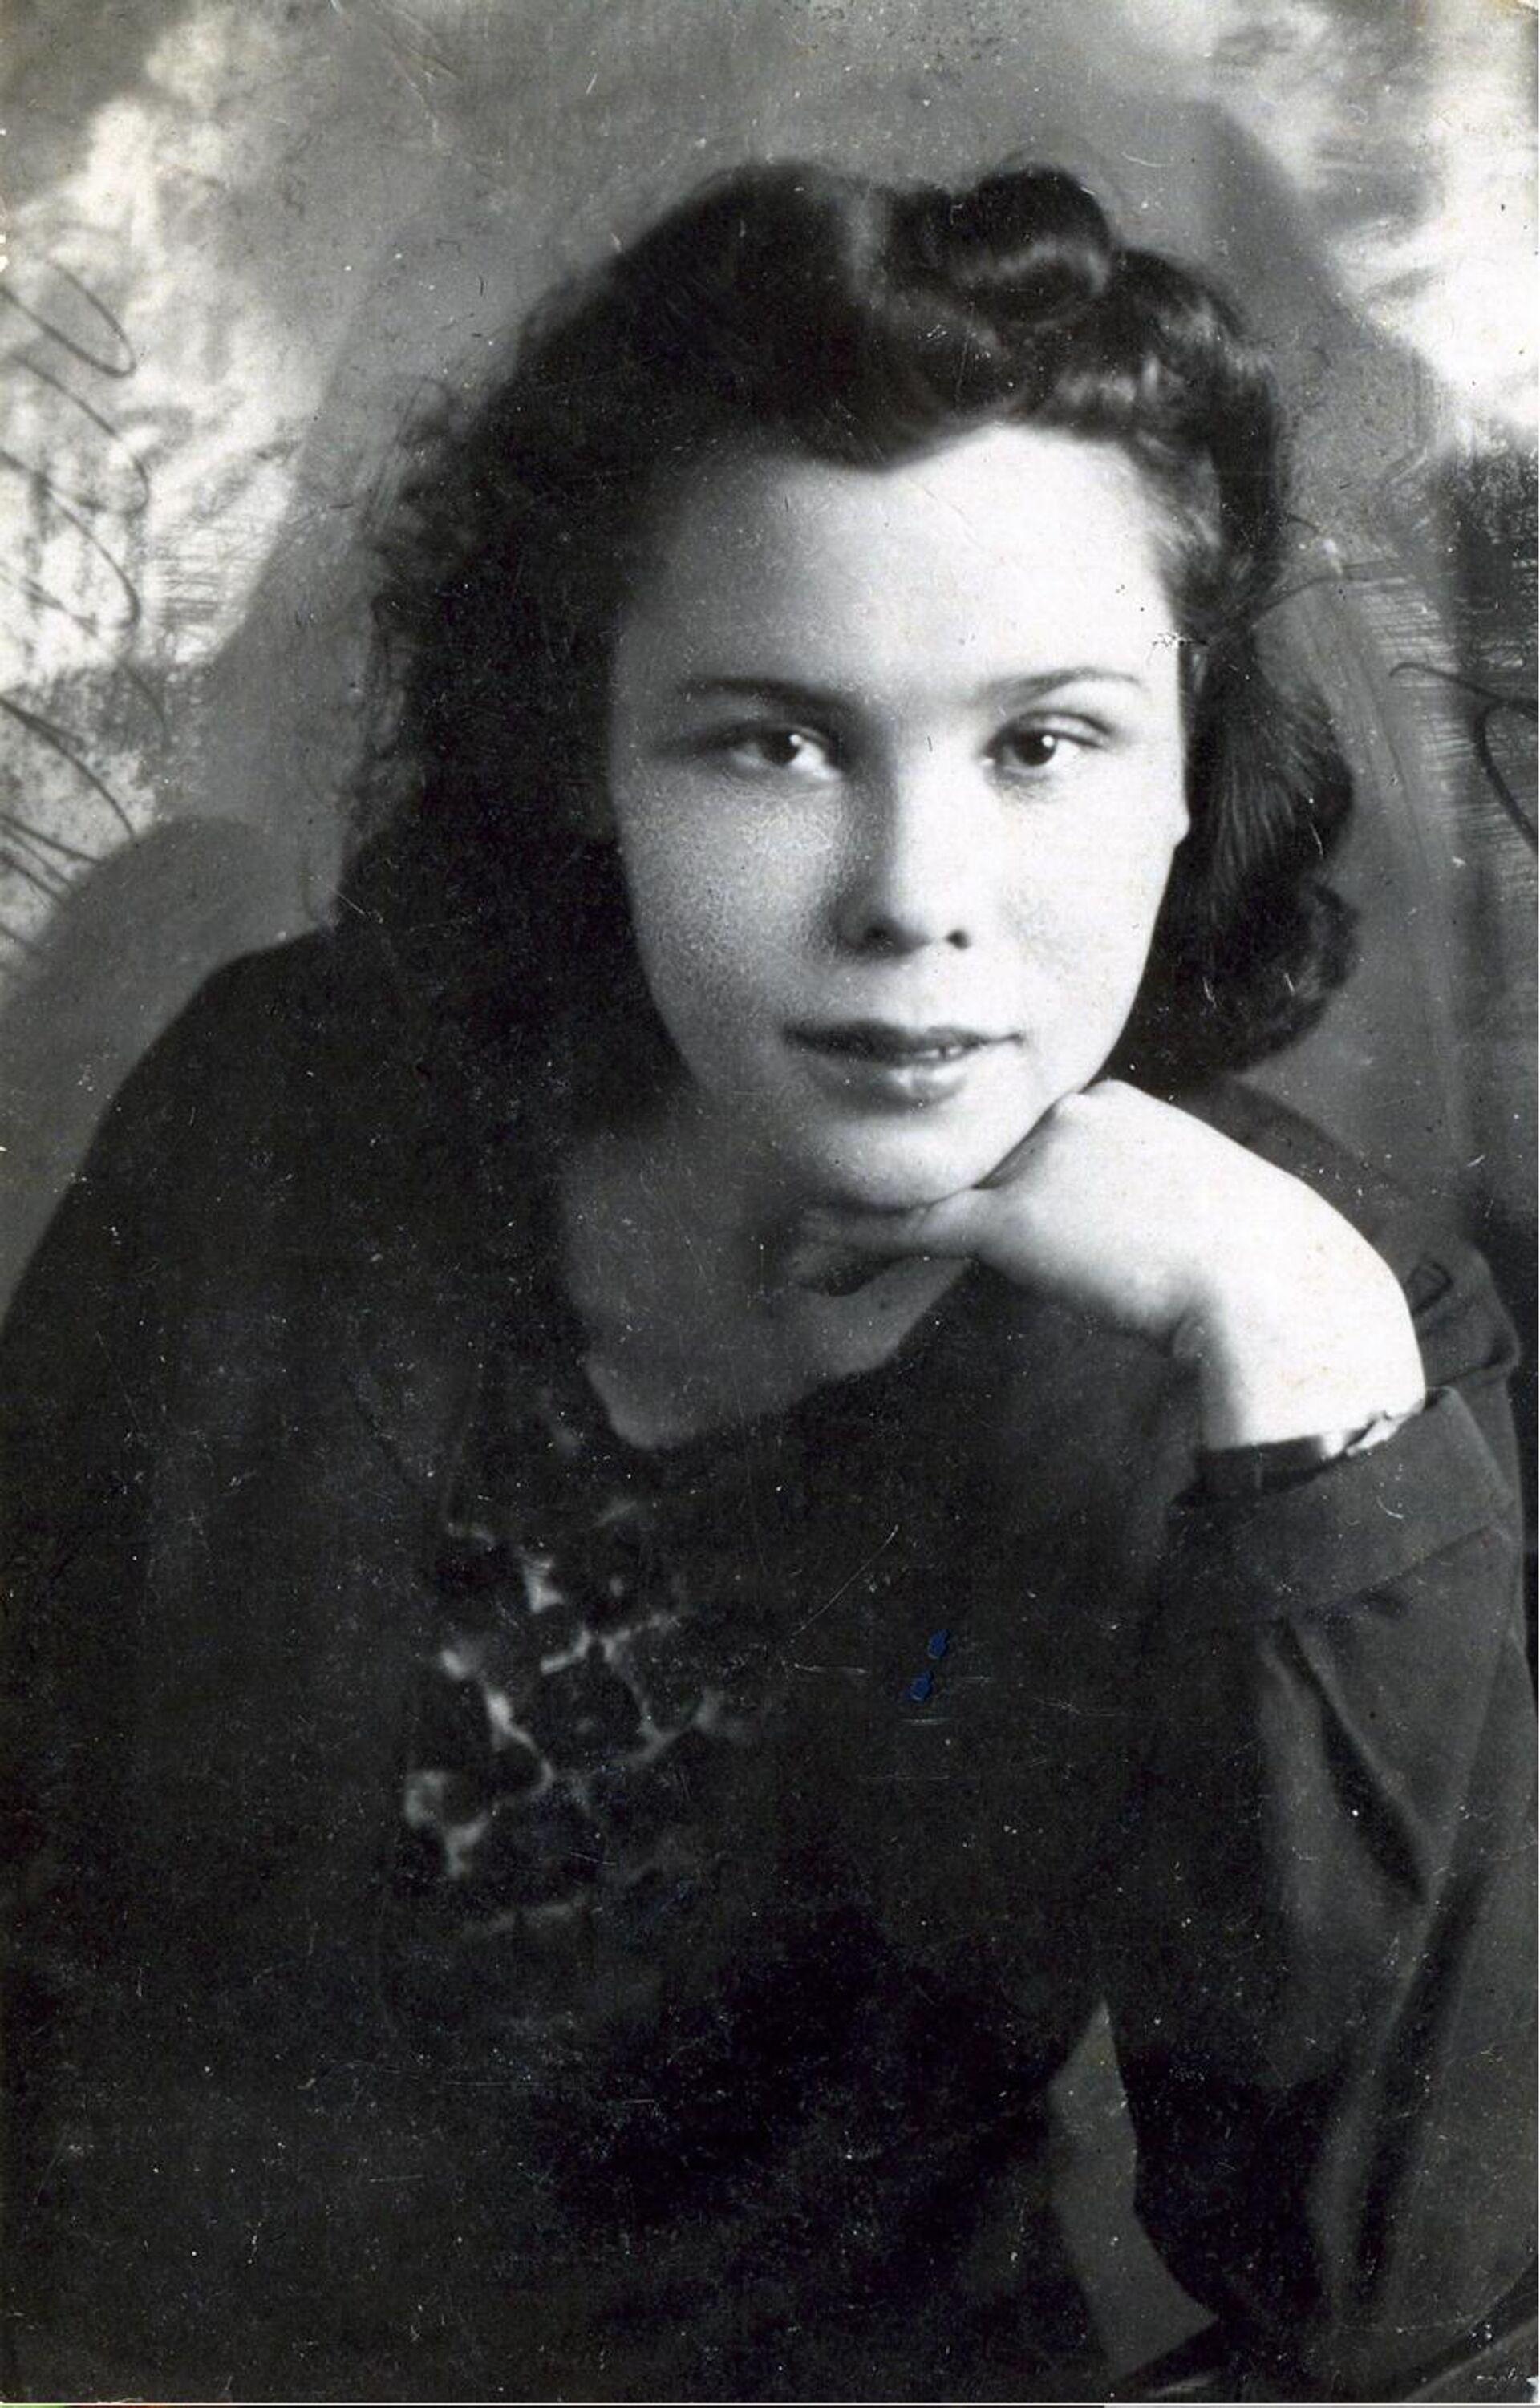 Валентина Буфетова 9 мая 1945 года, Сталинград - Sputnik Беларусь, 1920, 01.07.2021